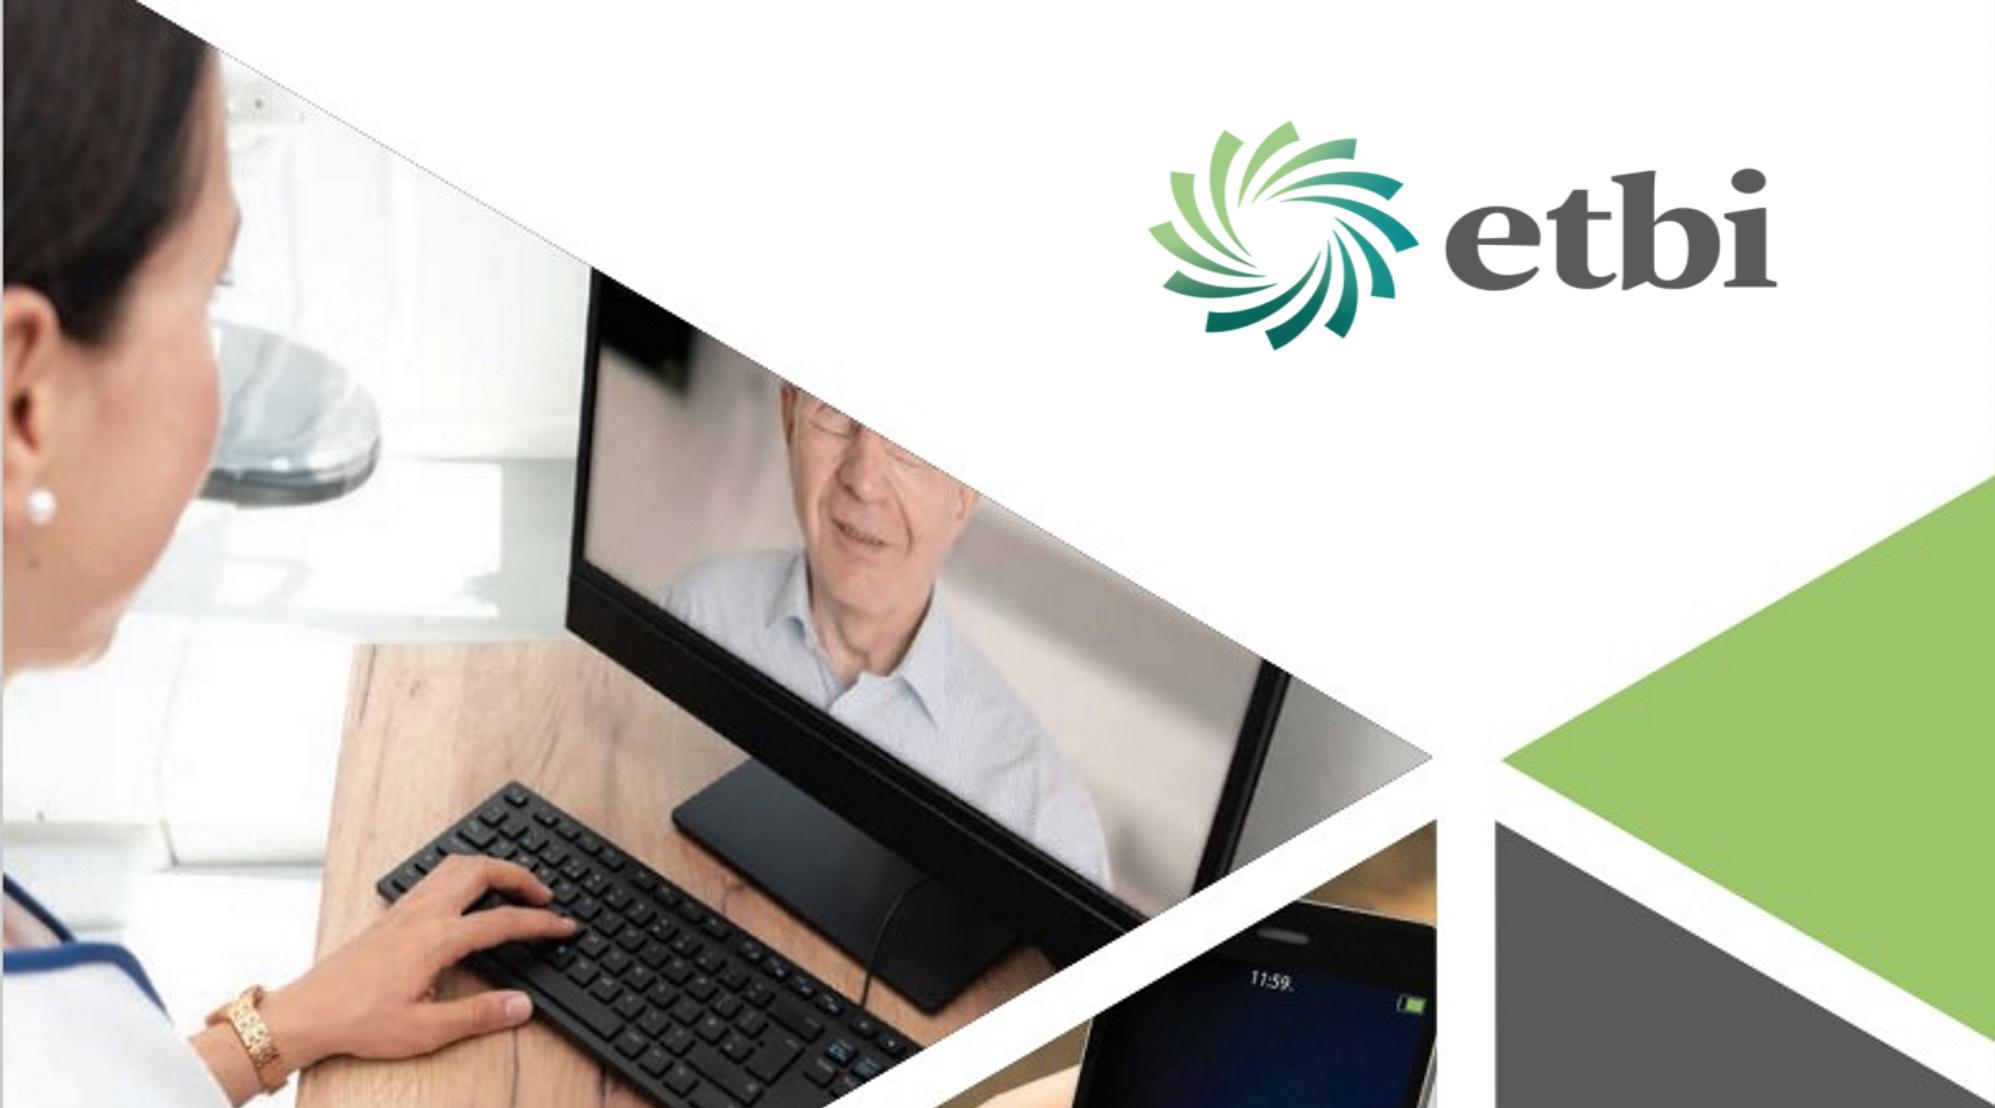 https://www.etbi.ie/wp-content/uploads/2021/09/learner-support-report.jpg